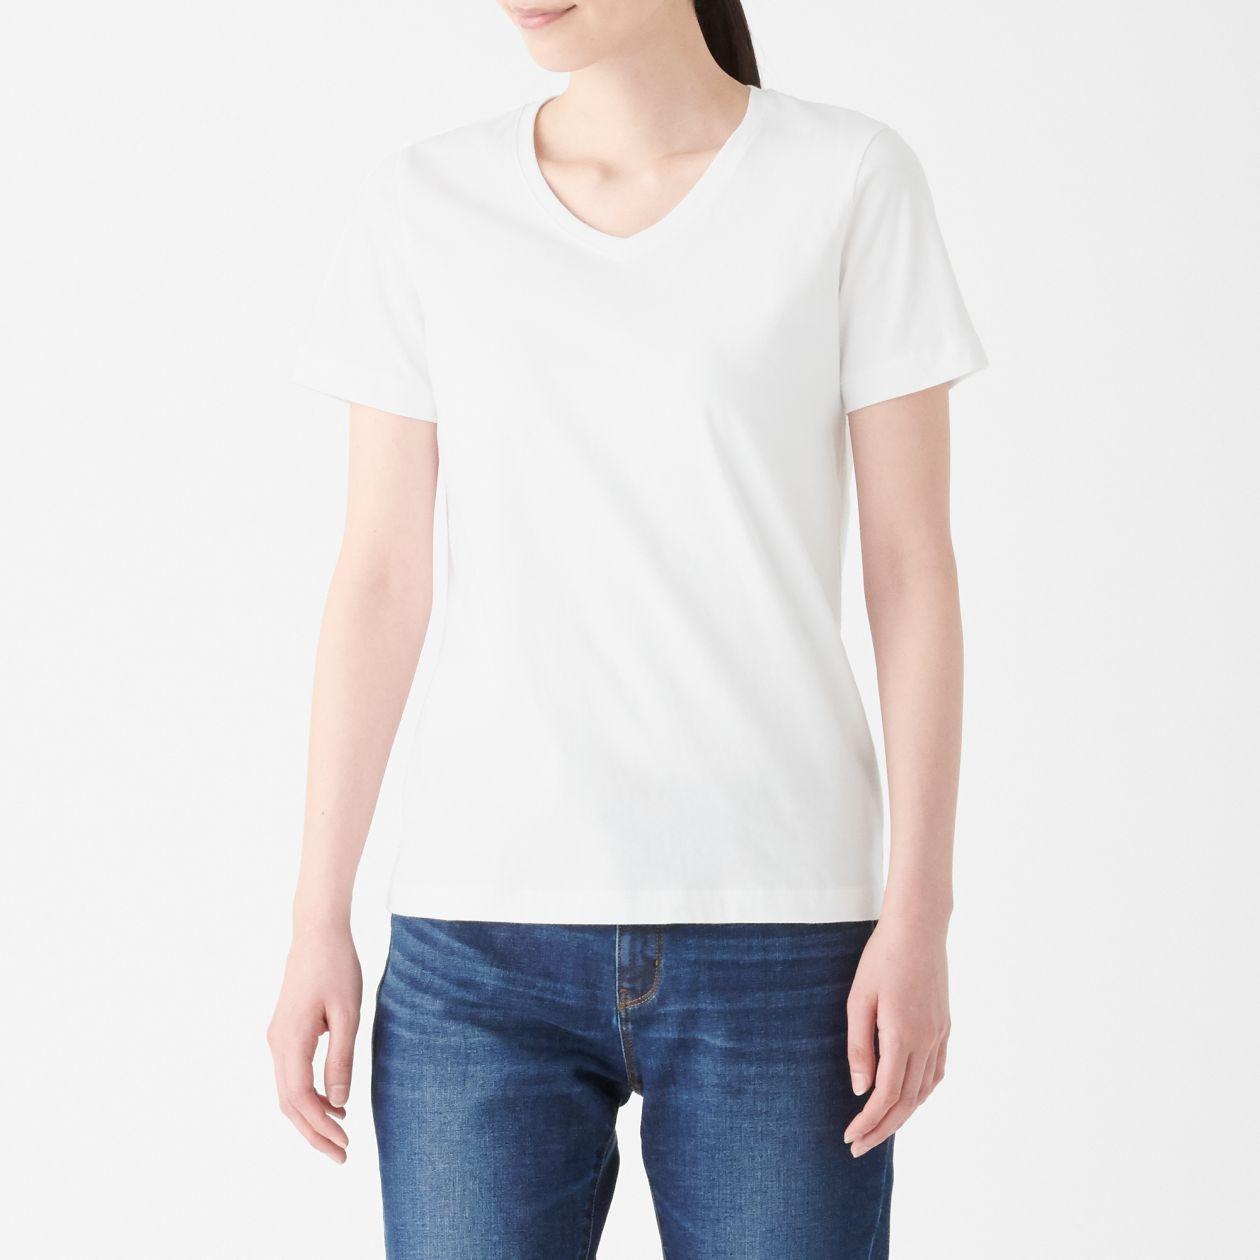 OGC V NECK S/S T SHIRT (WHITE)